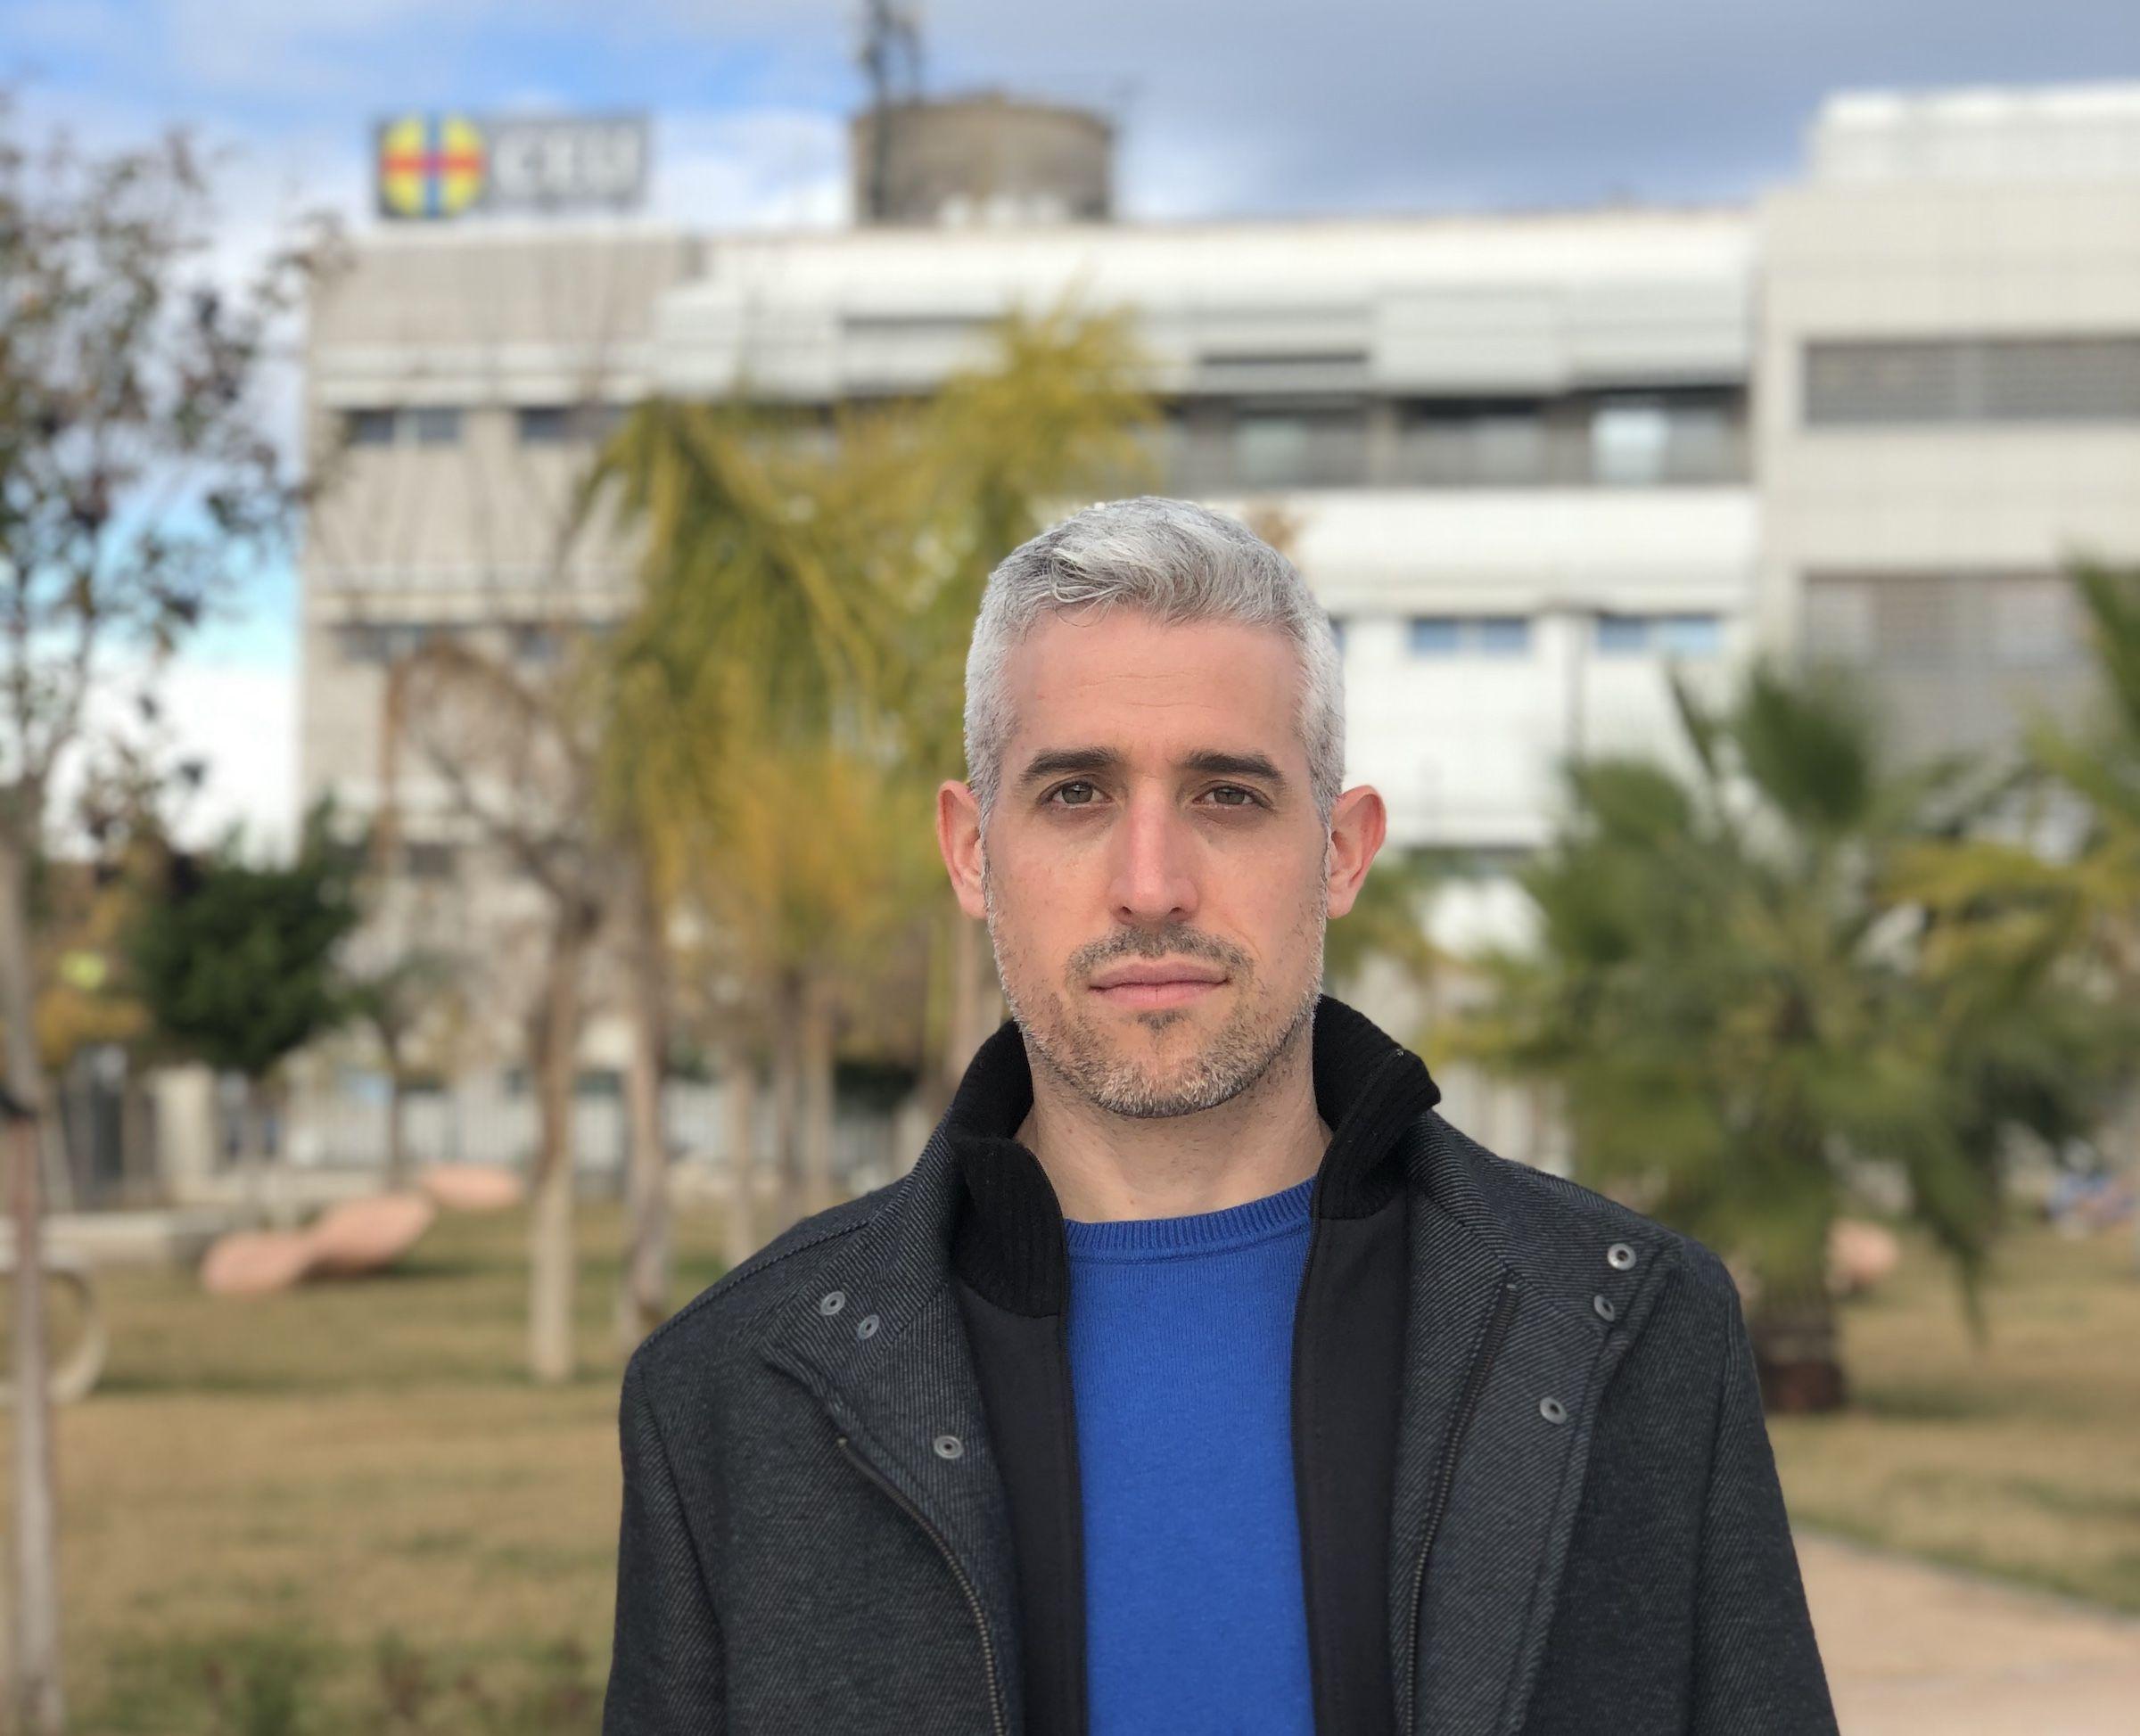 Jordi Renau, profesor de la ESET e investigador del Grupo TecEner de la CEU UCH.